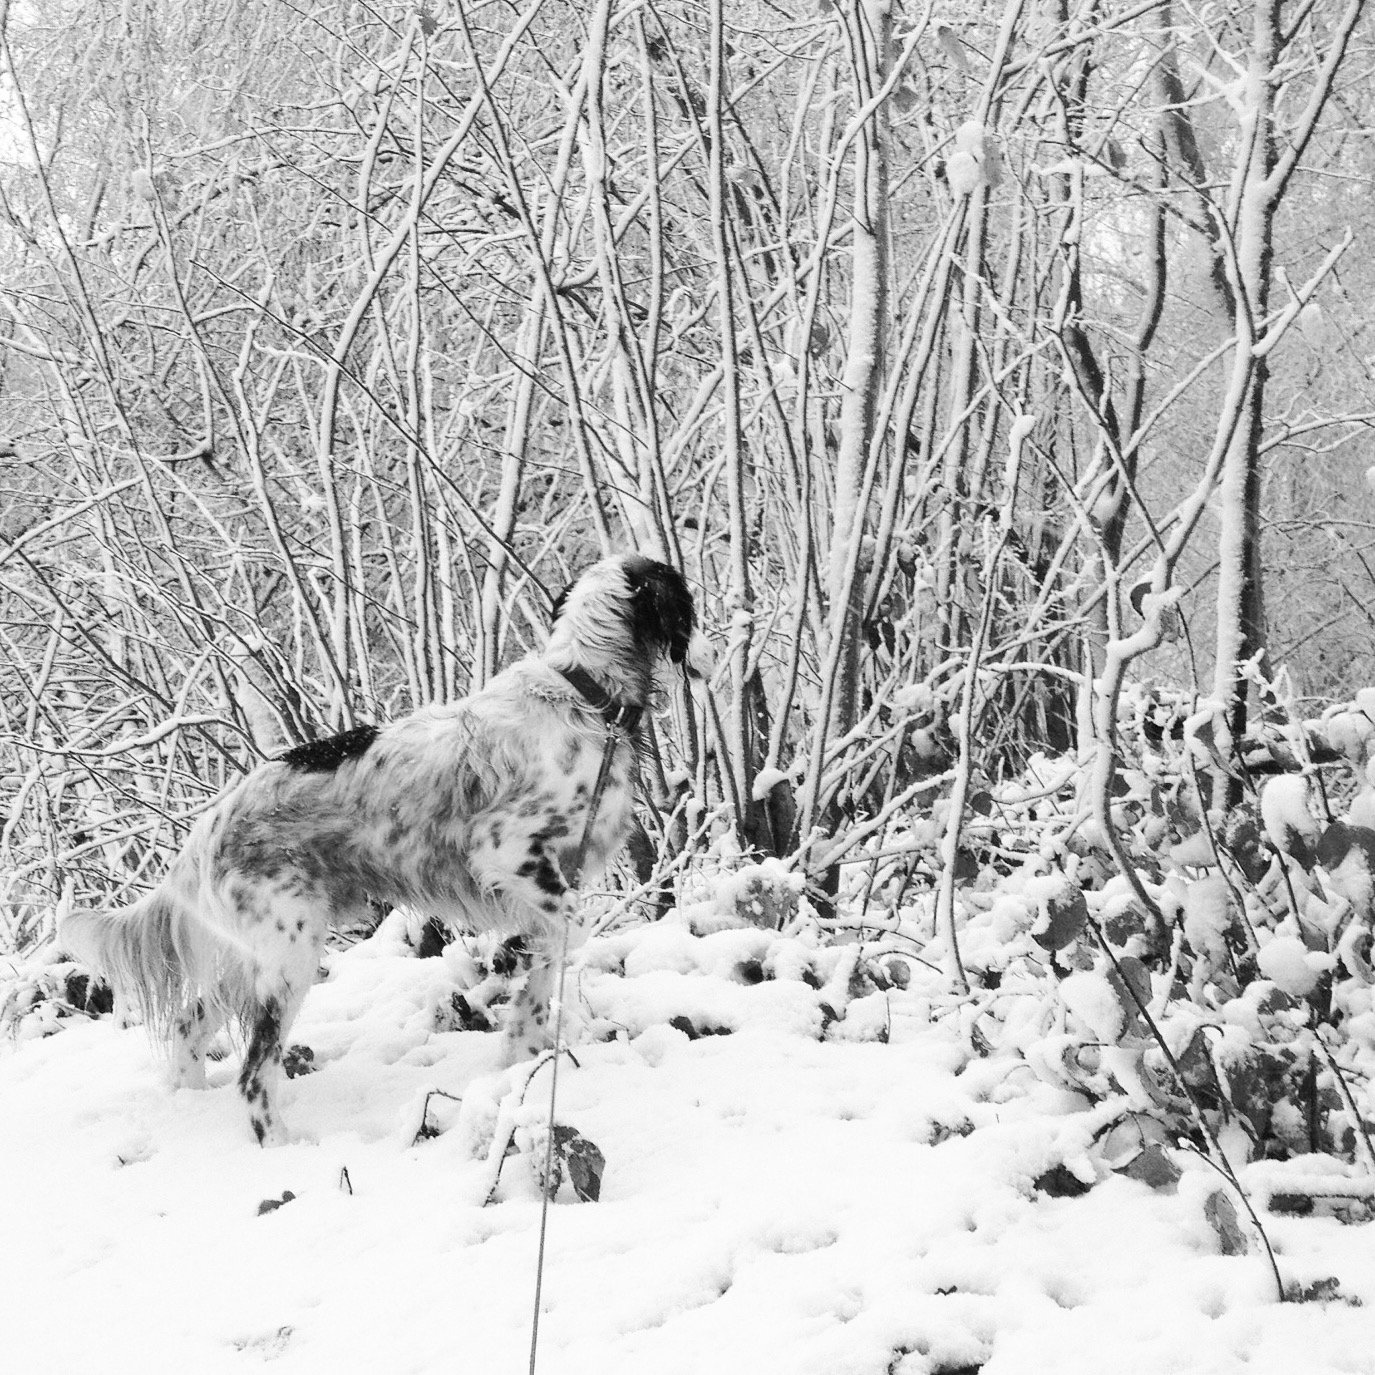 kiko in de sneeuw irmsblog